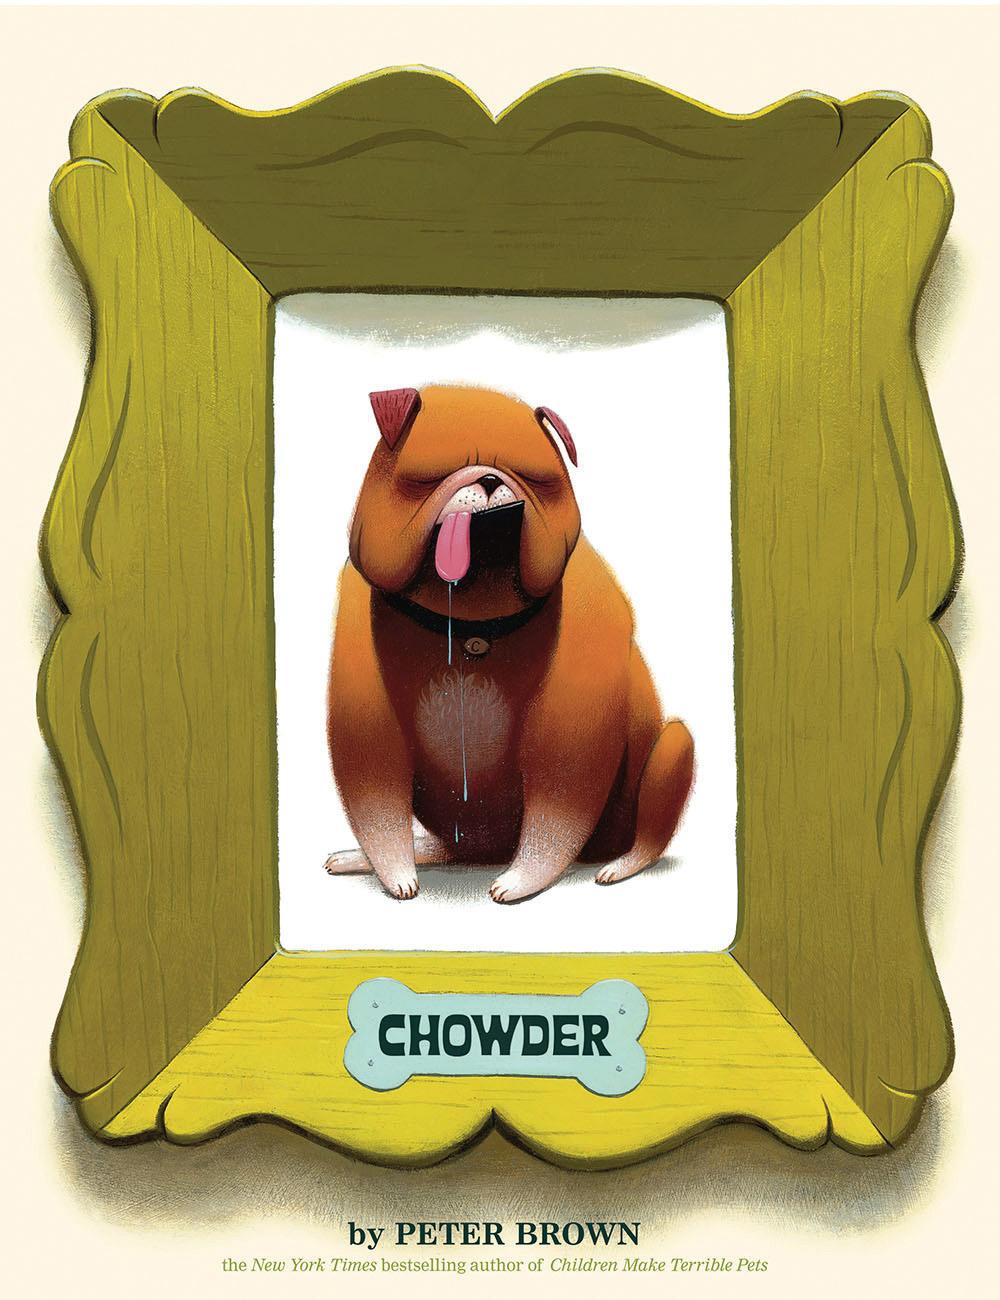 Brown, Peter 2012_06 - CHOWDER - PB - RLM PR.jpg